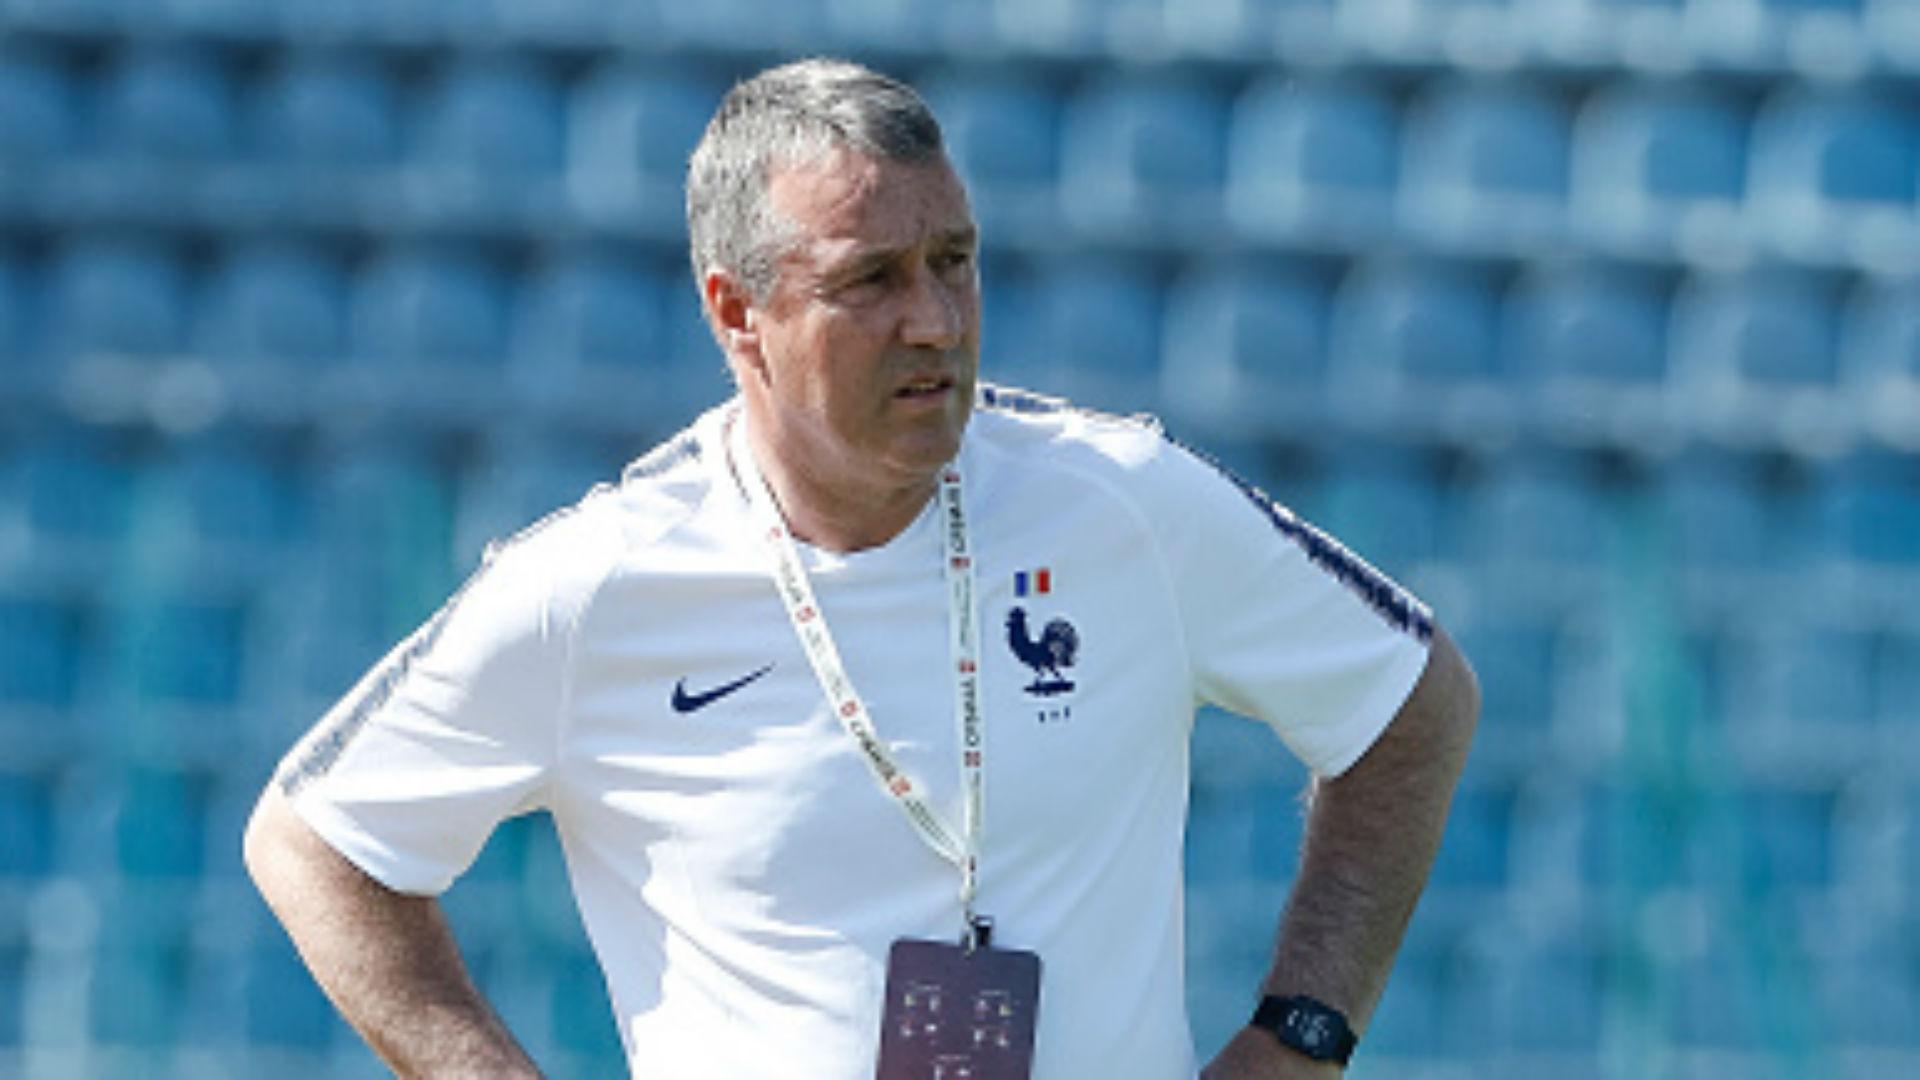 France U18 : Jean-Claude Giuntini explique pourquoi il a refusé l'Olympique de Marseille